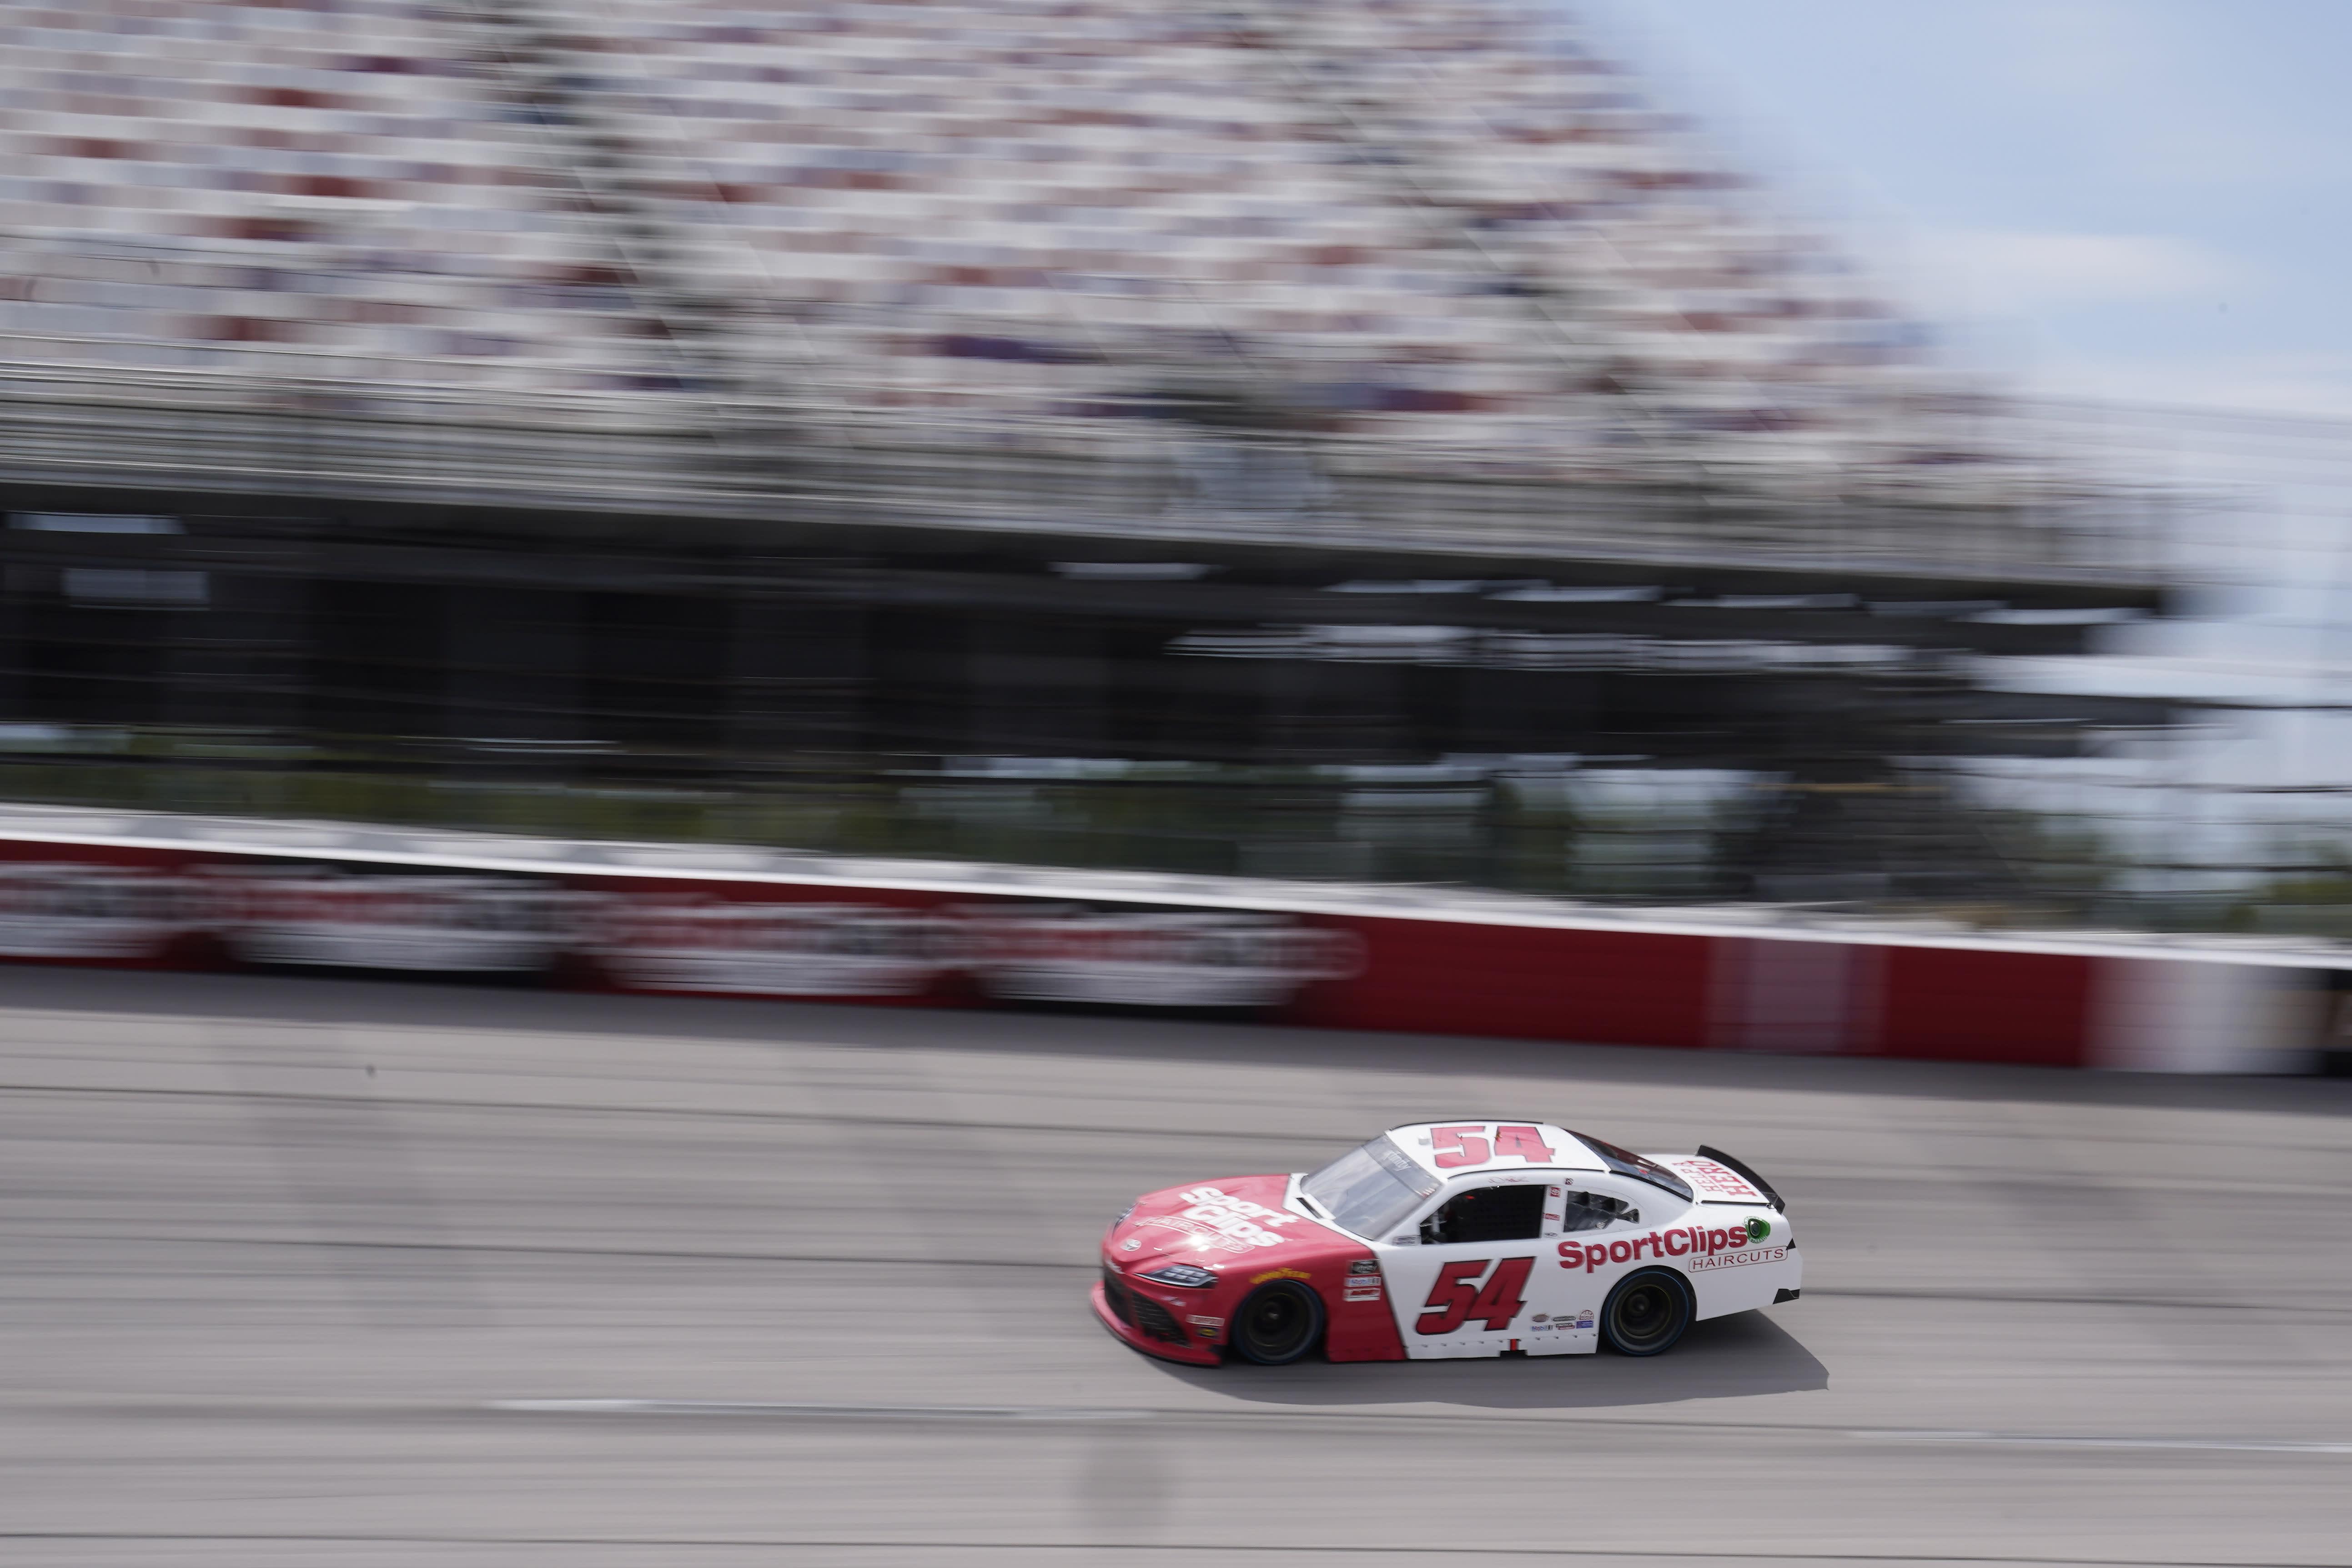 Joe Gibbs (54) moves through Turn 4 during a NASCAR Xfinity Series auto race Saturday, Sept. 5, 2020, in Darlington, S.C. (AP Photo/Chris Carlson)